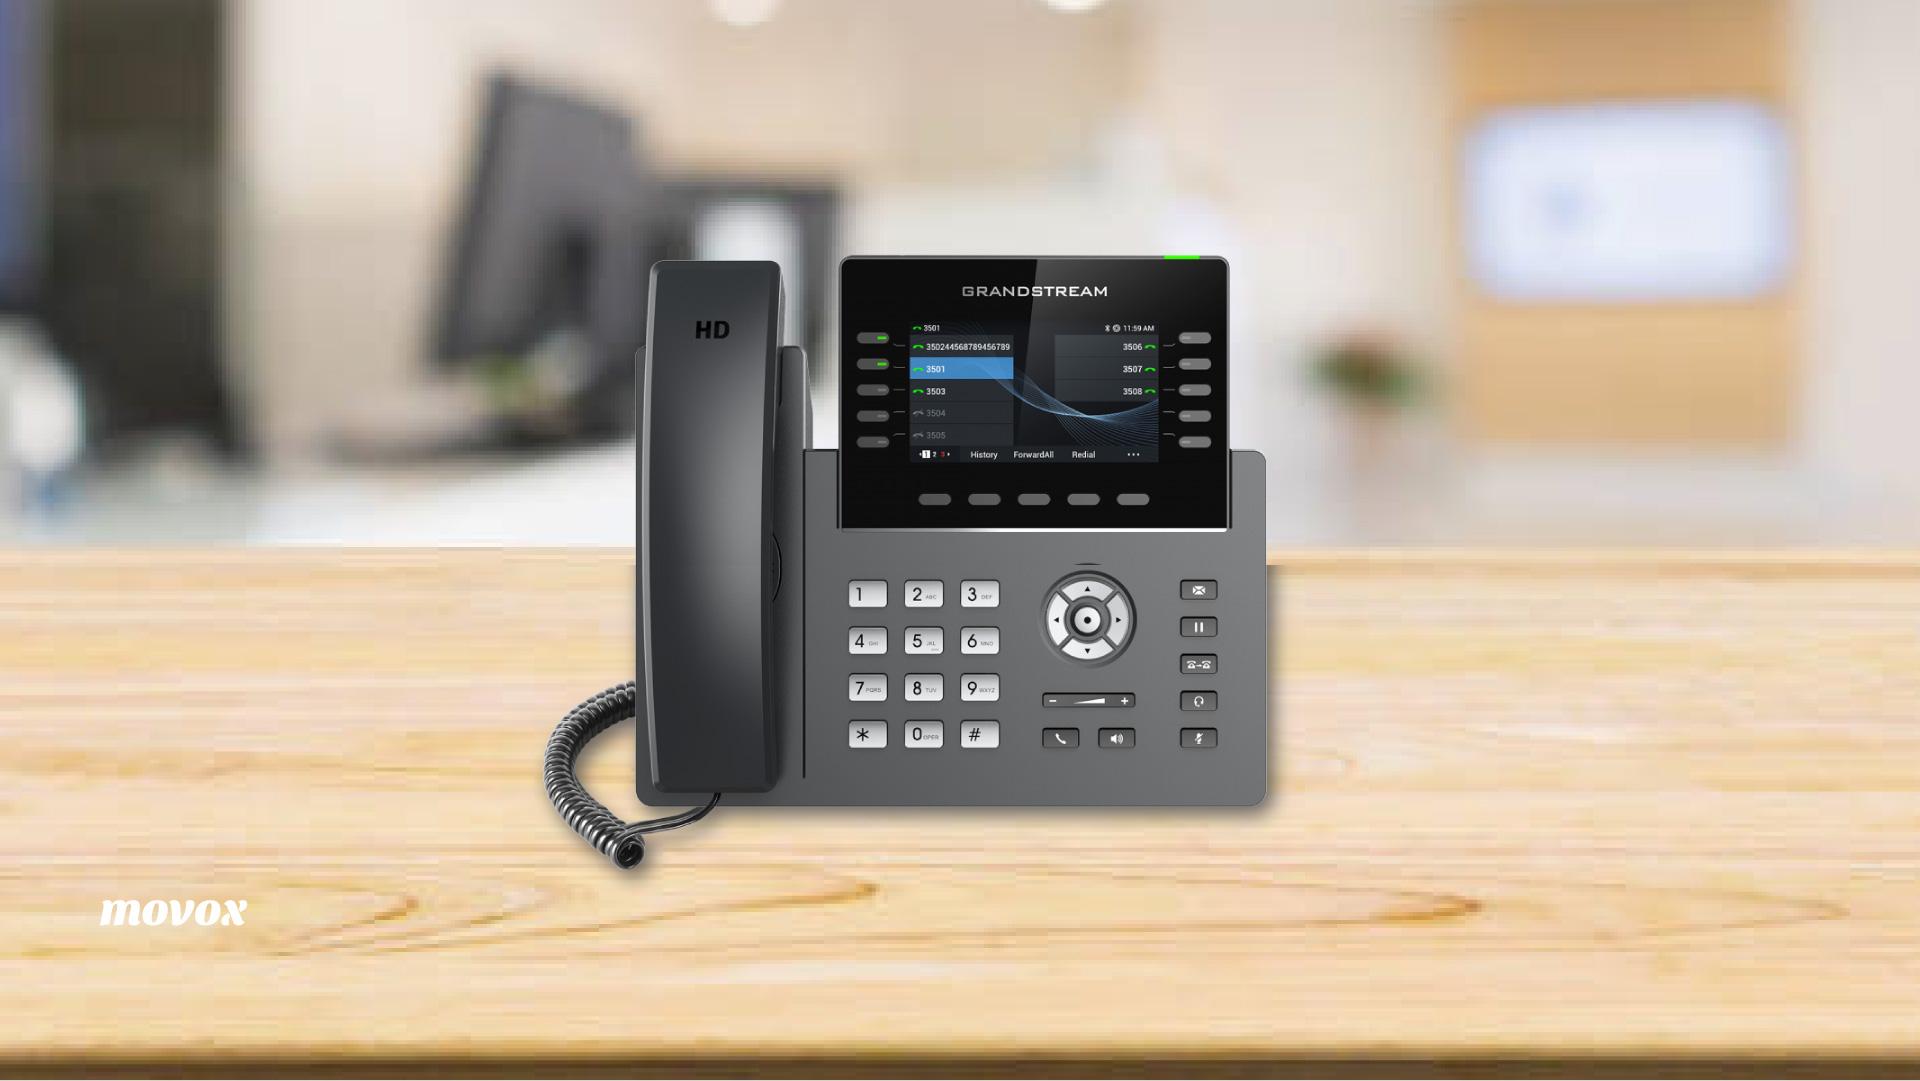 Grandstream's new 2600 series IP phones